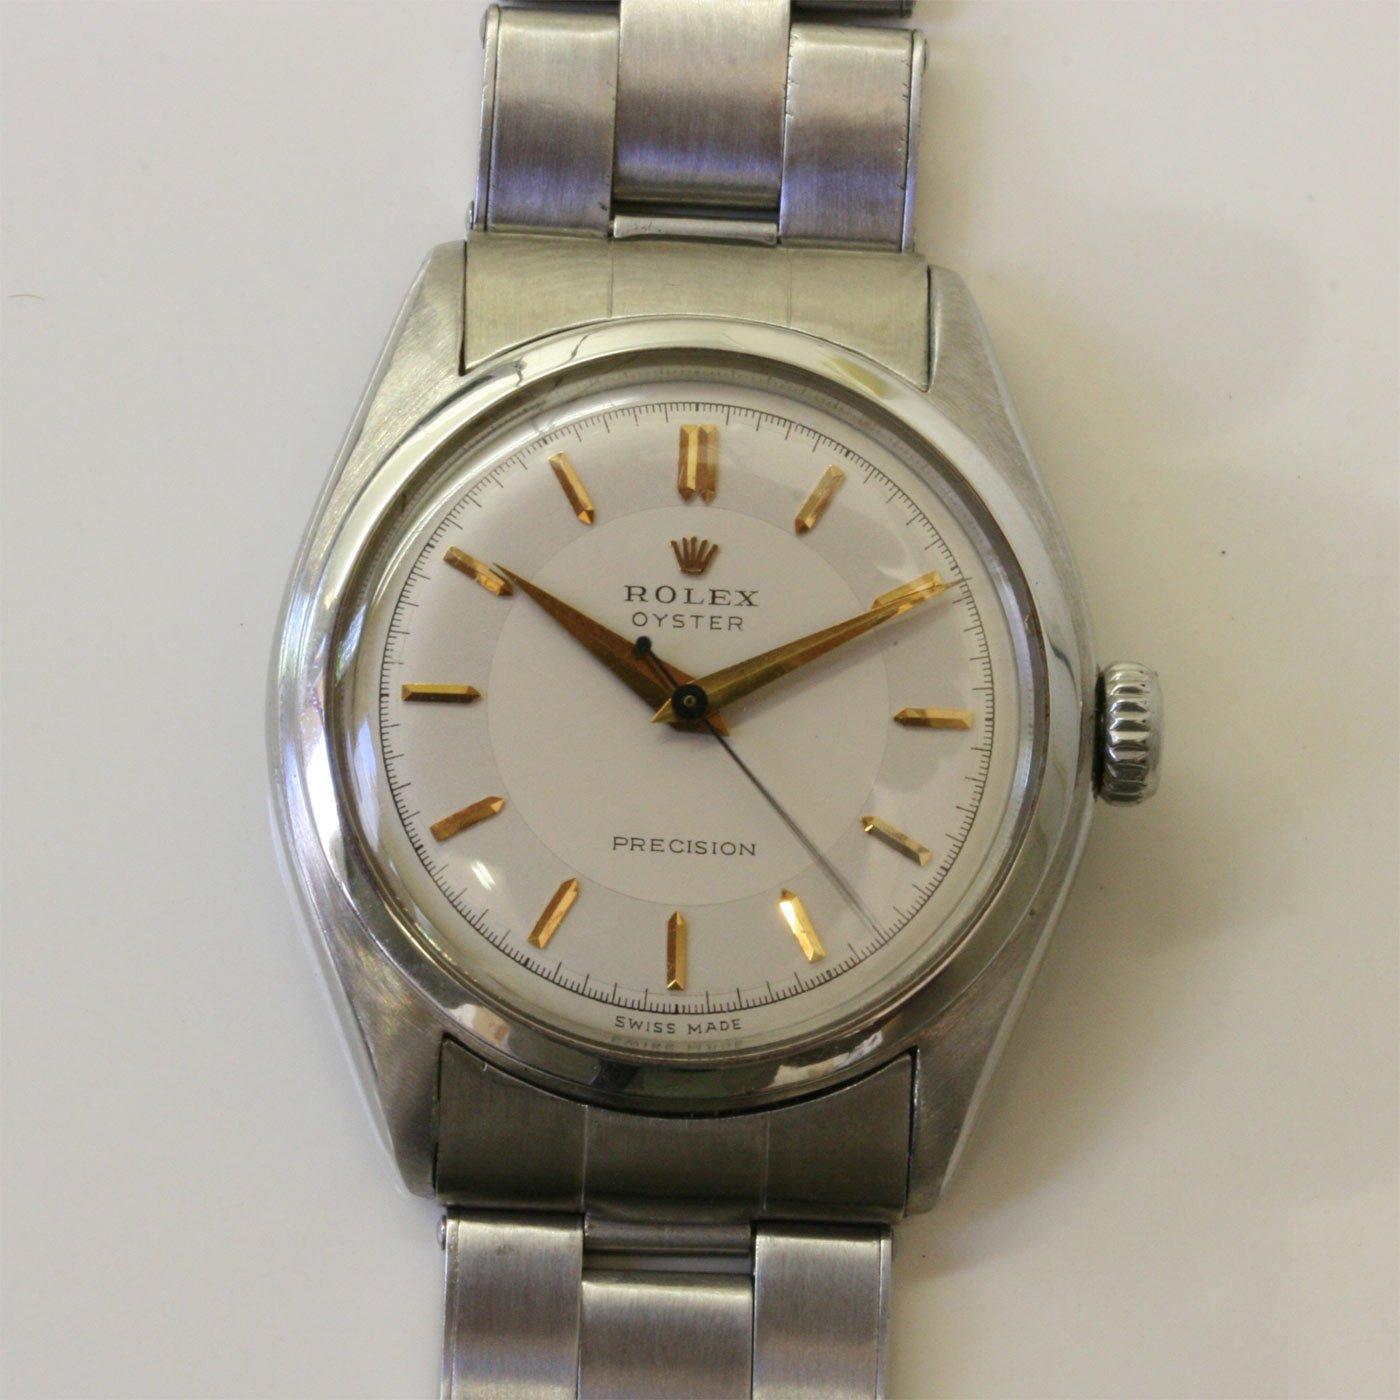 buy vintage rolex watch sold items sold rolex watches